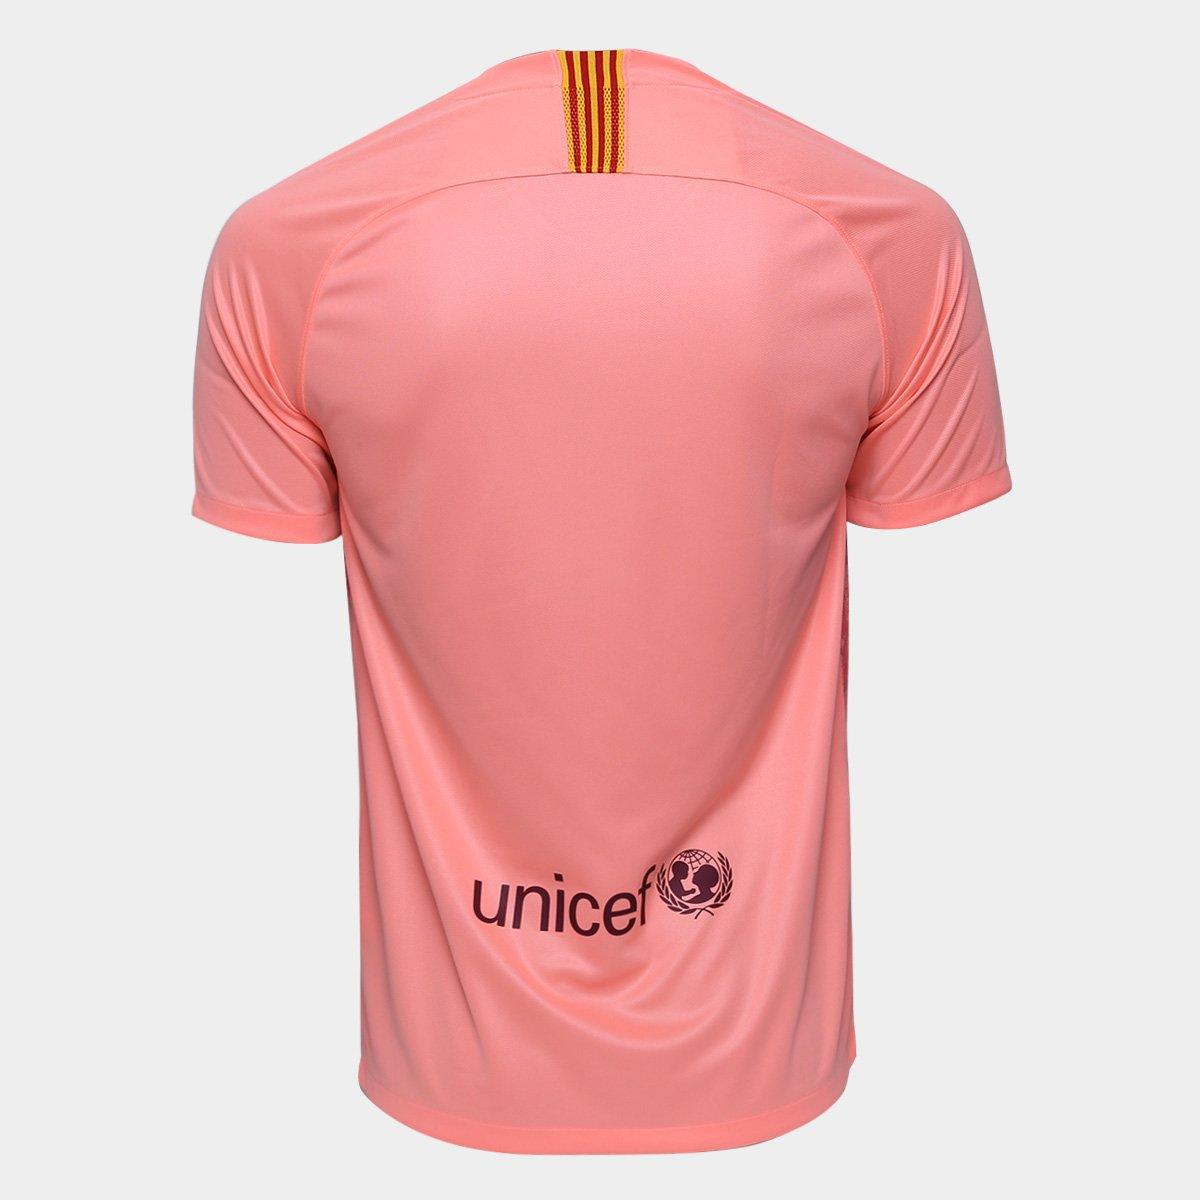 Camisa Barcelona Third 2018 s nº - Torcedor Nike Masculina - Salmão ... 54b43100b5c97